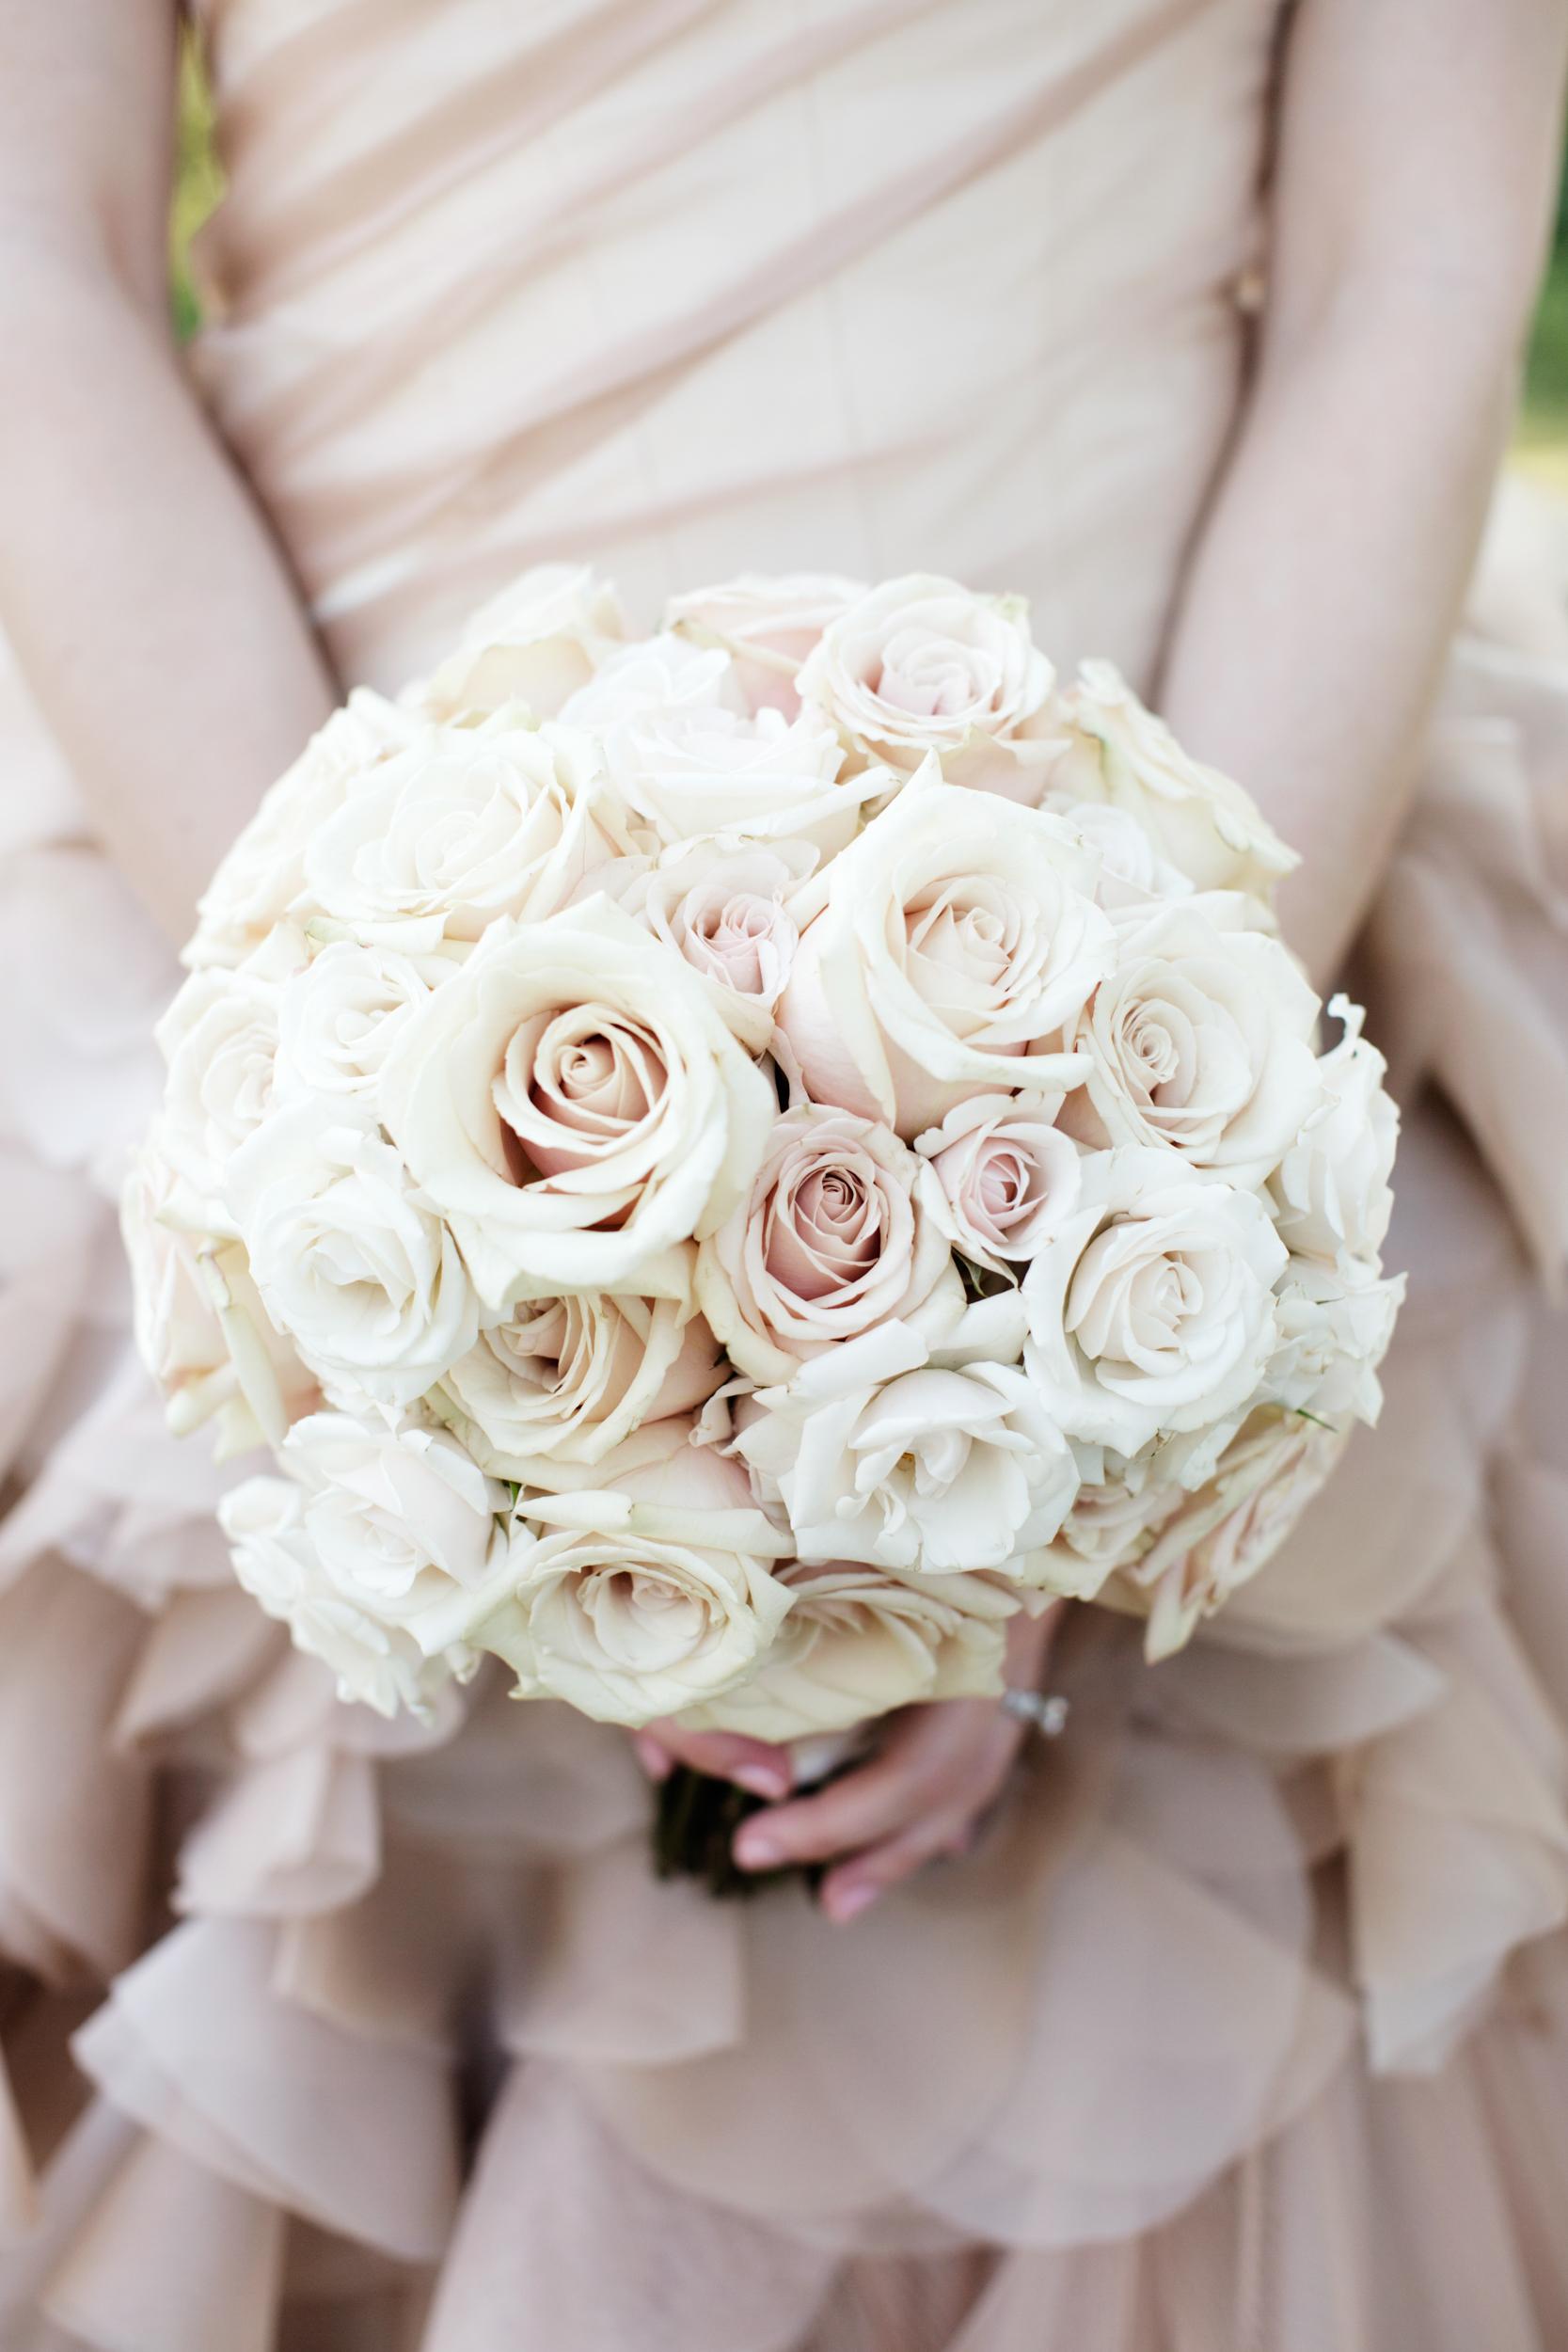 Ceci_New_York_Ceci_Style_Ceci_Johnson_Luxury_Lifestyle_Floral_Lace_Wedding_Letterpress_Inspiration_Design_Custom_Couture_Personalized_Invitations_-81.jpg